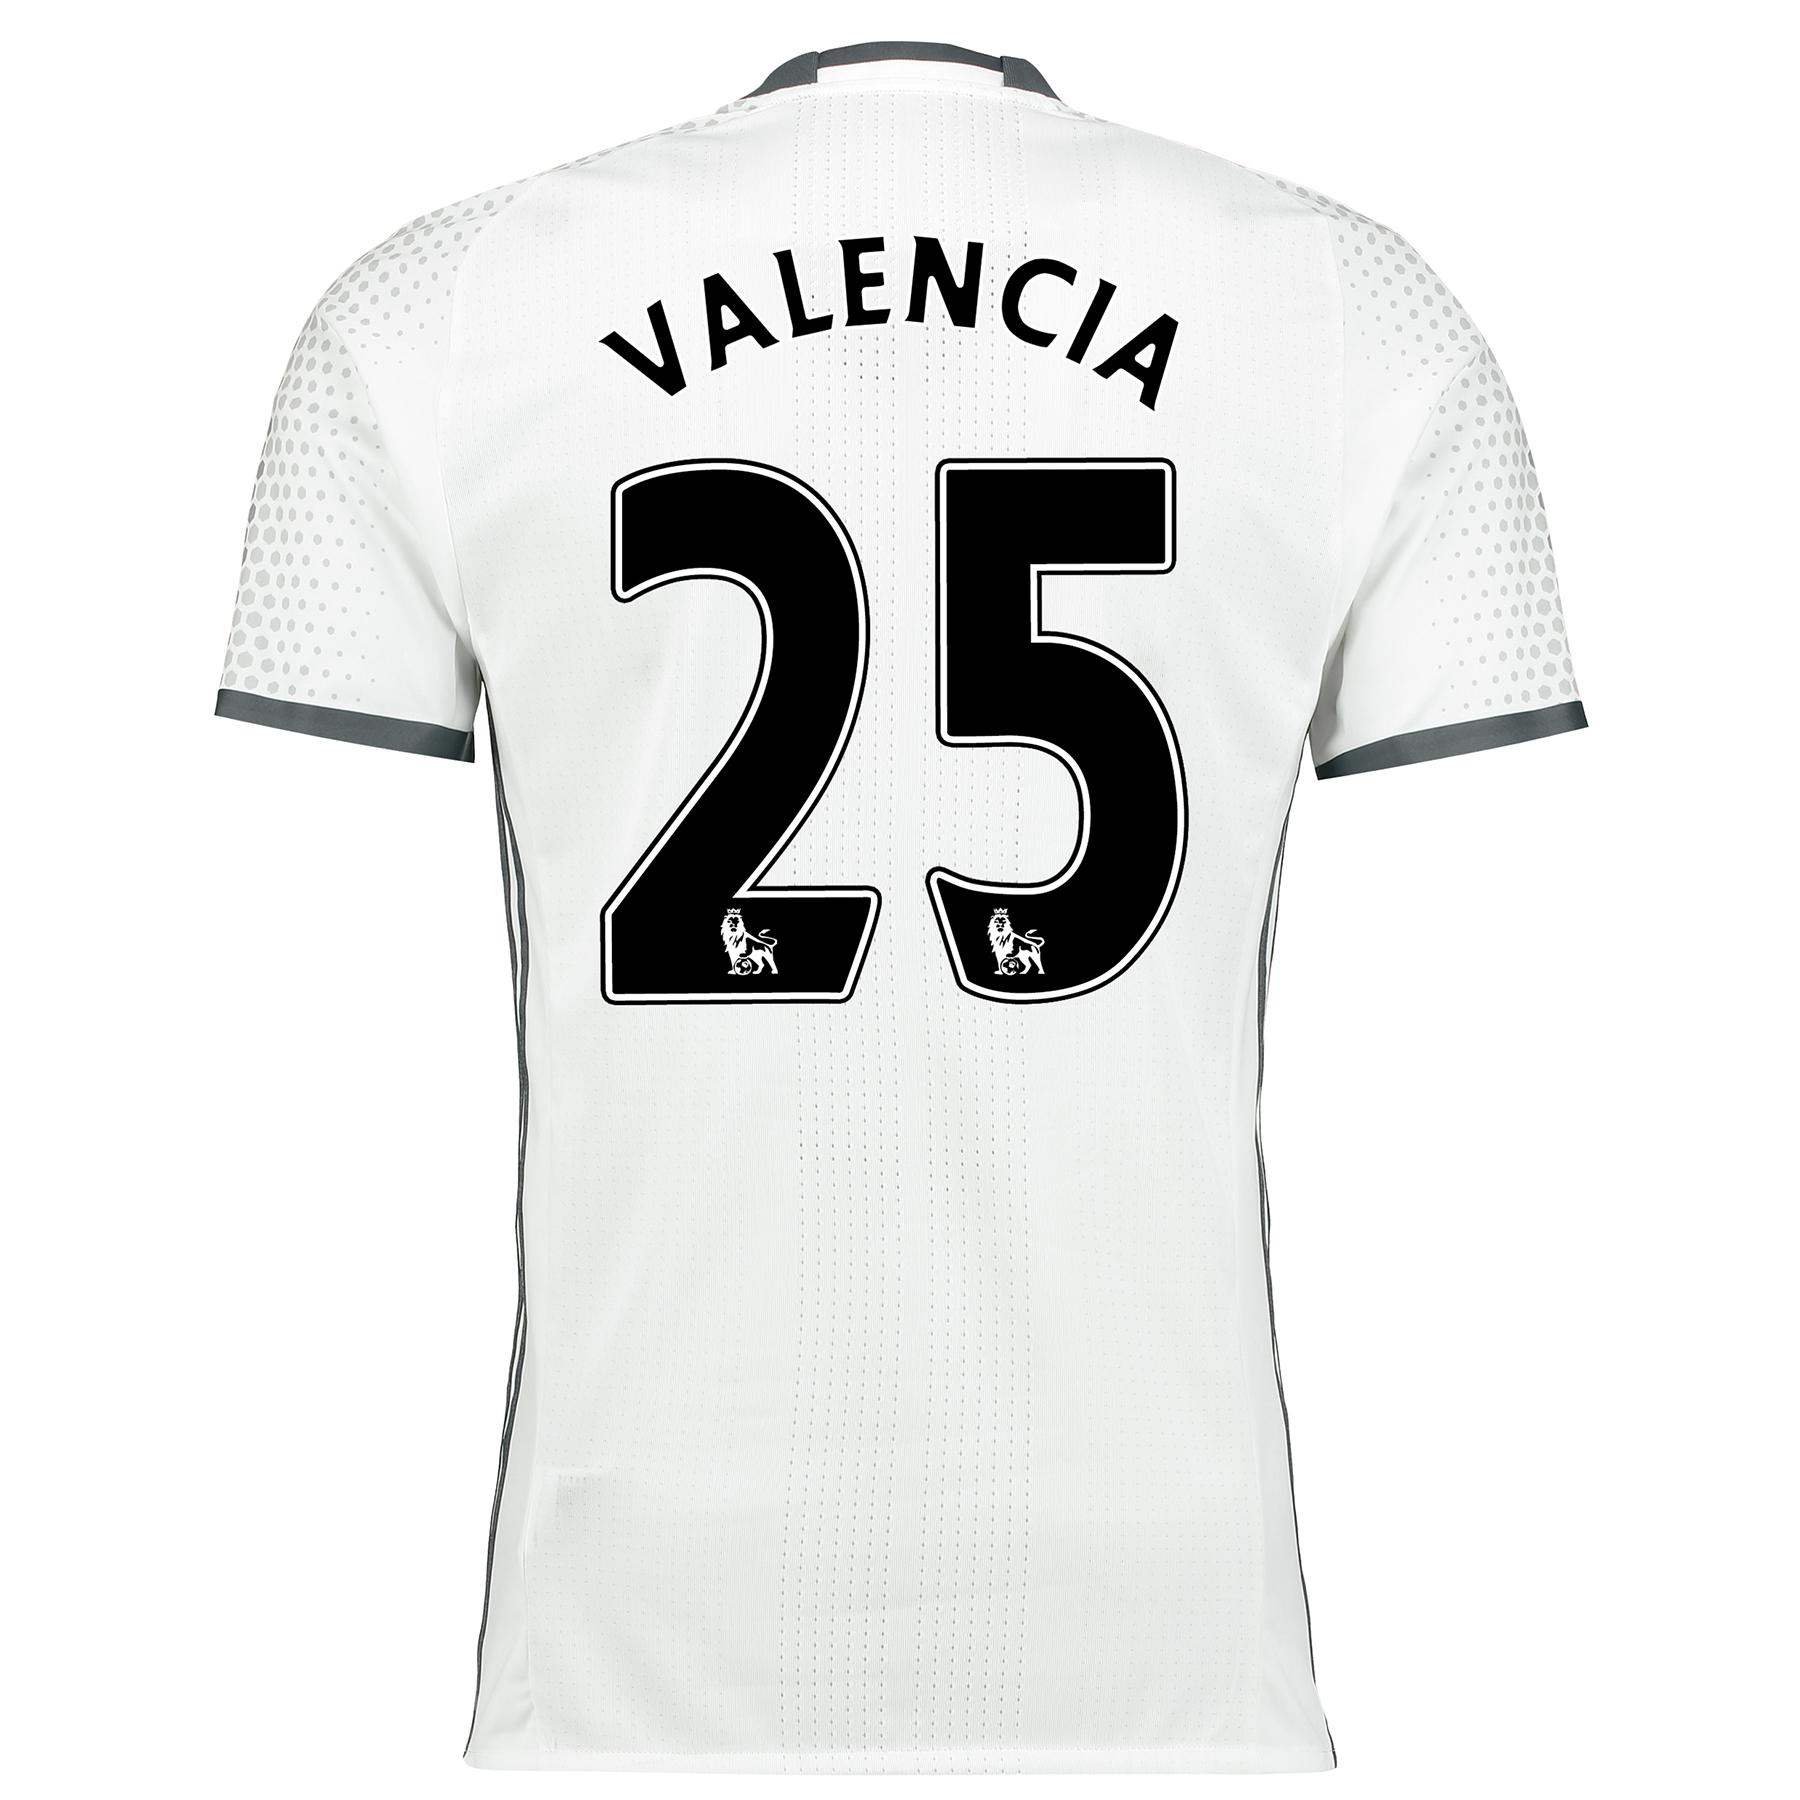 Manchester United Third Adi Zero Shirt 2016-17 with Valencia 25 printi